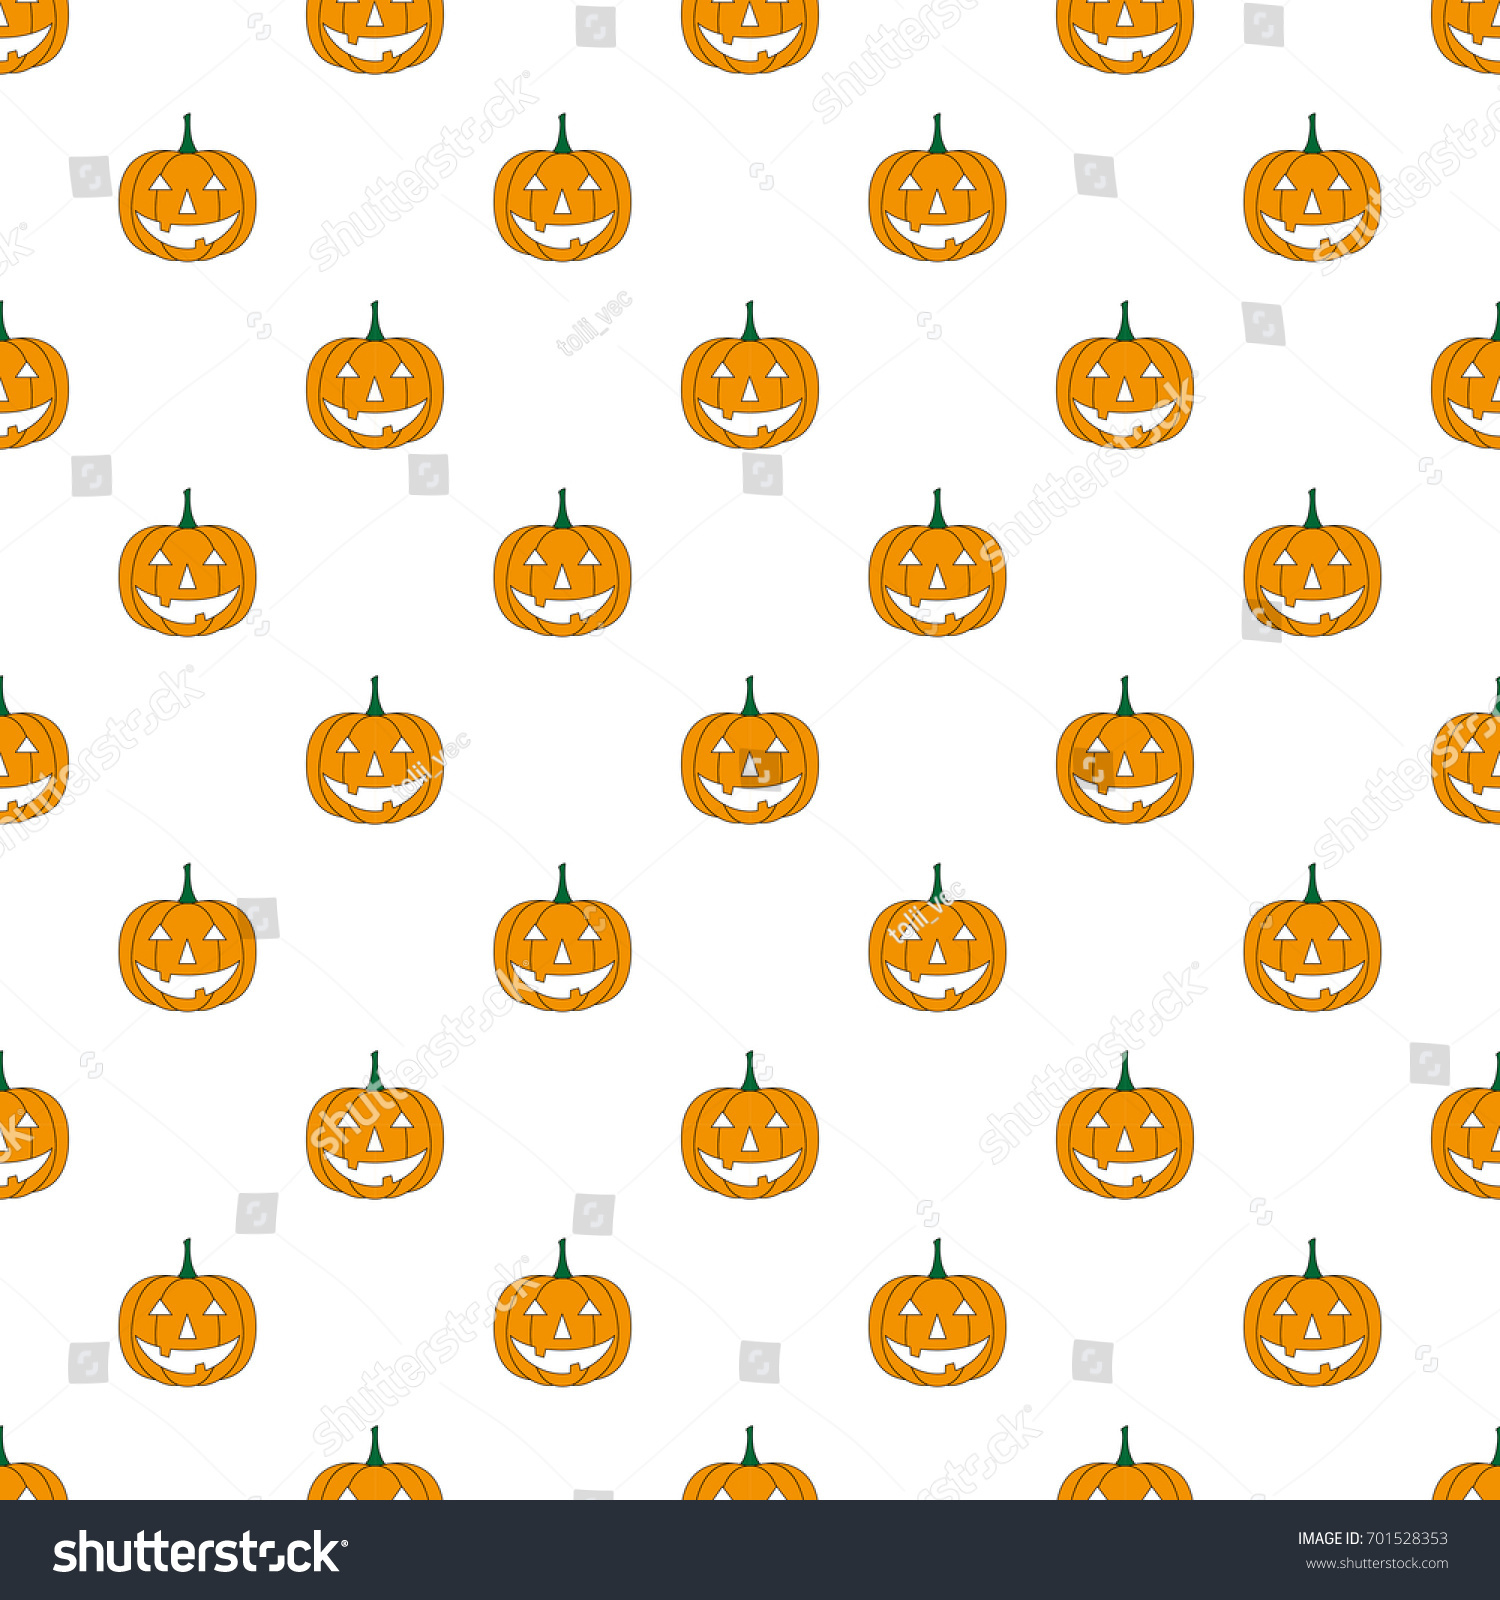 Halloween Pattern Pumpkin Cartoon Halloween Pumpkin Stock Vector Royalty Free 701528353